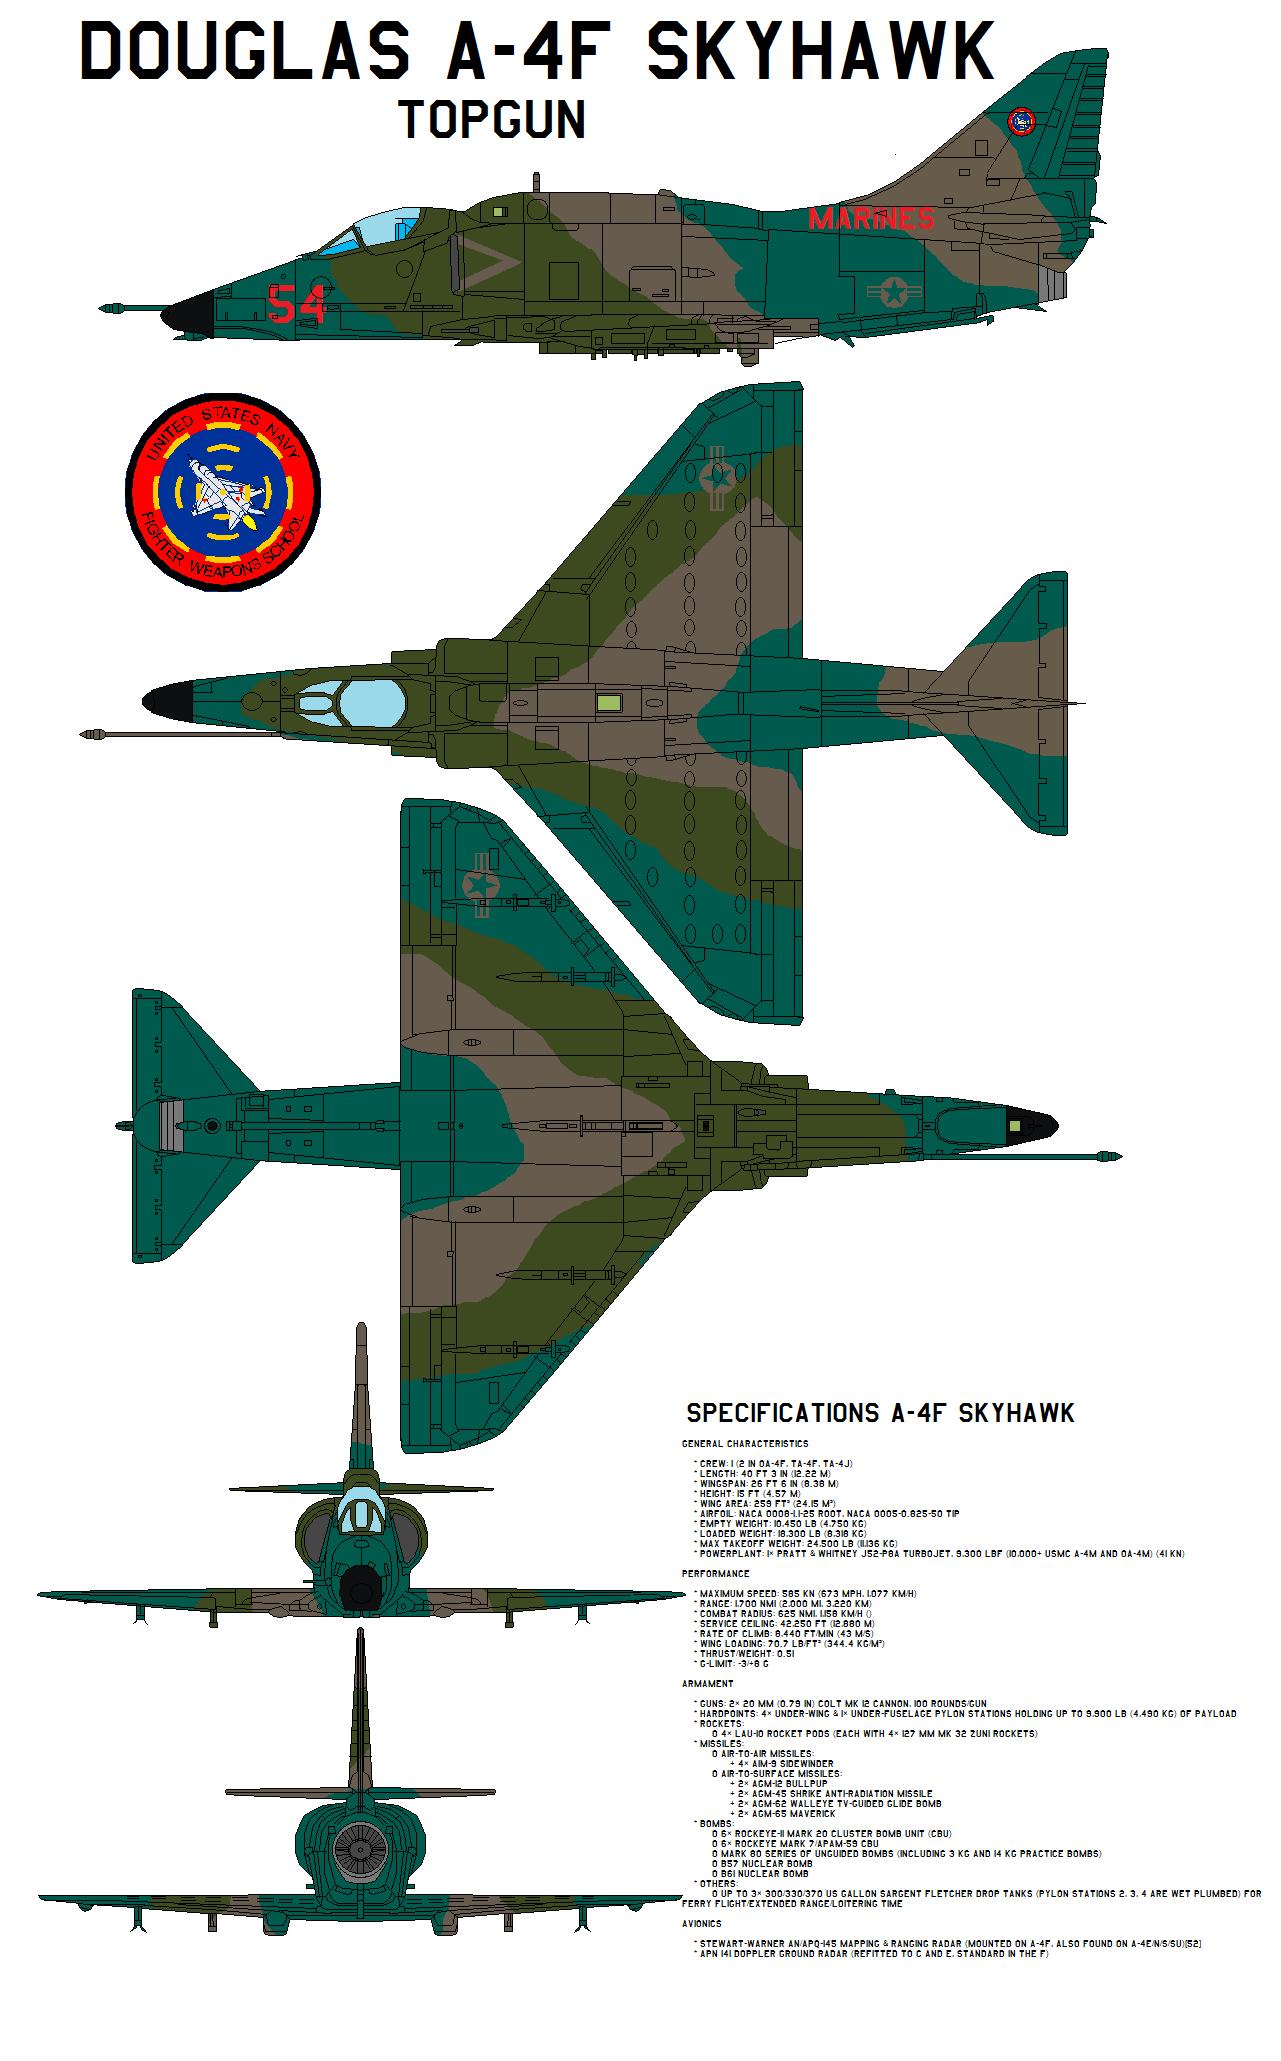 Douglas A-4F Skyhawk topgun by bagera3005